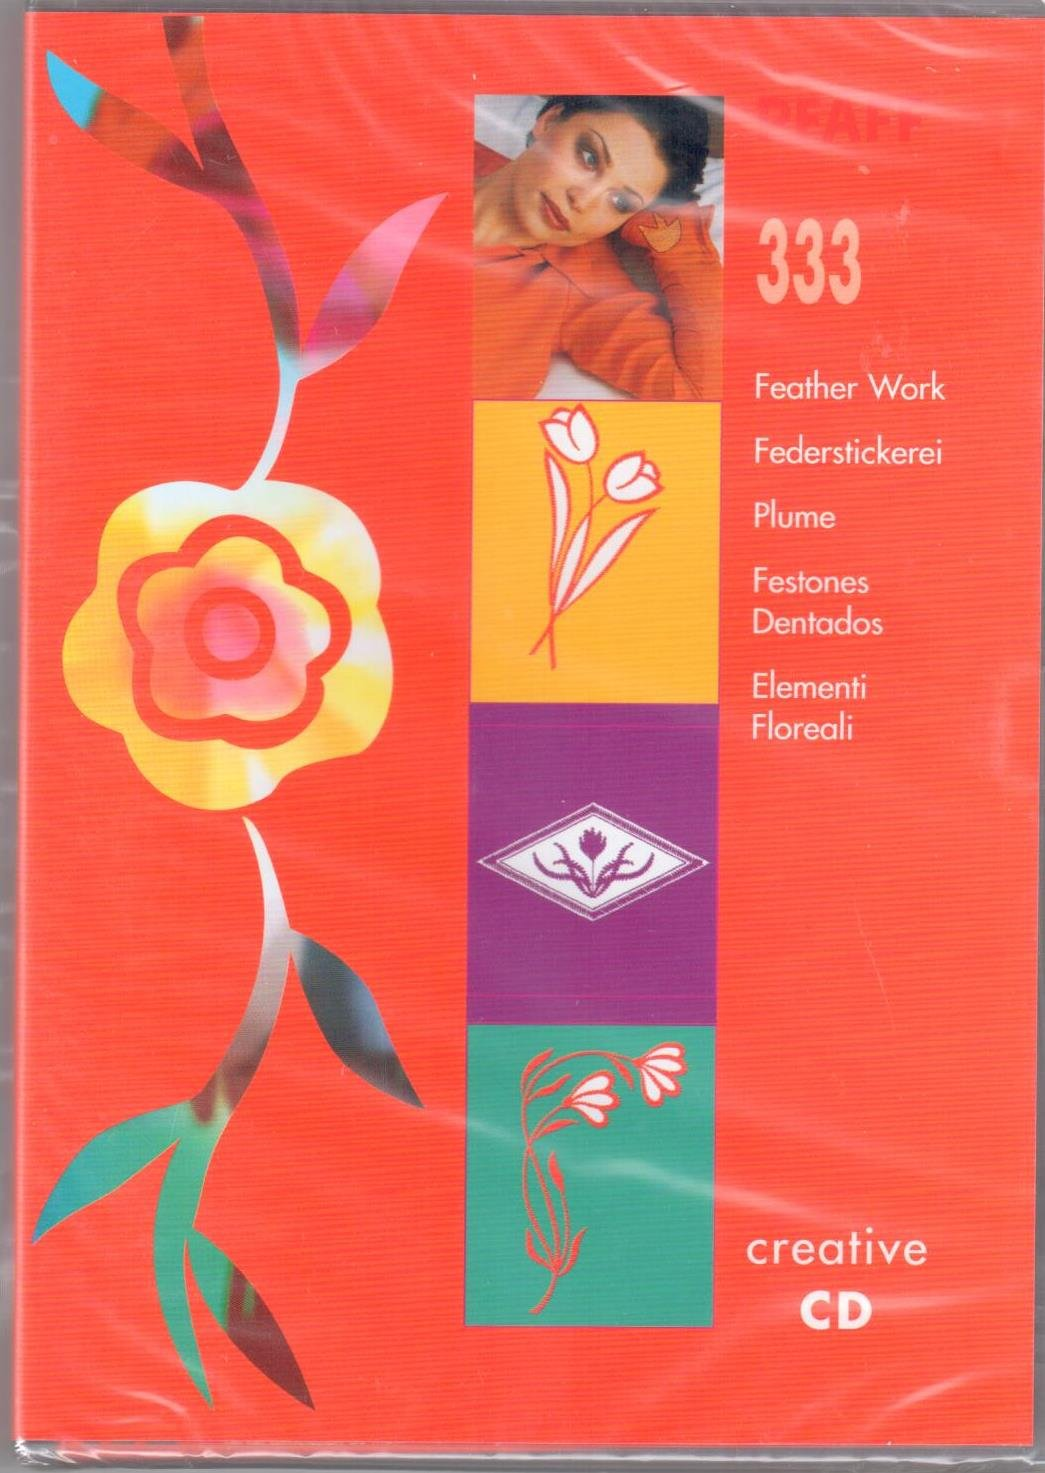 Pfaff Creative CD 333 Feather Work